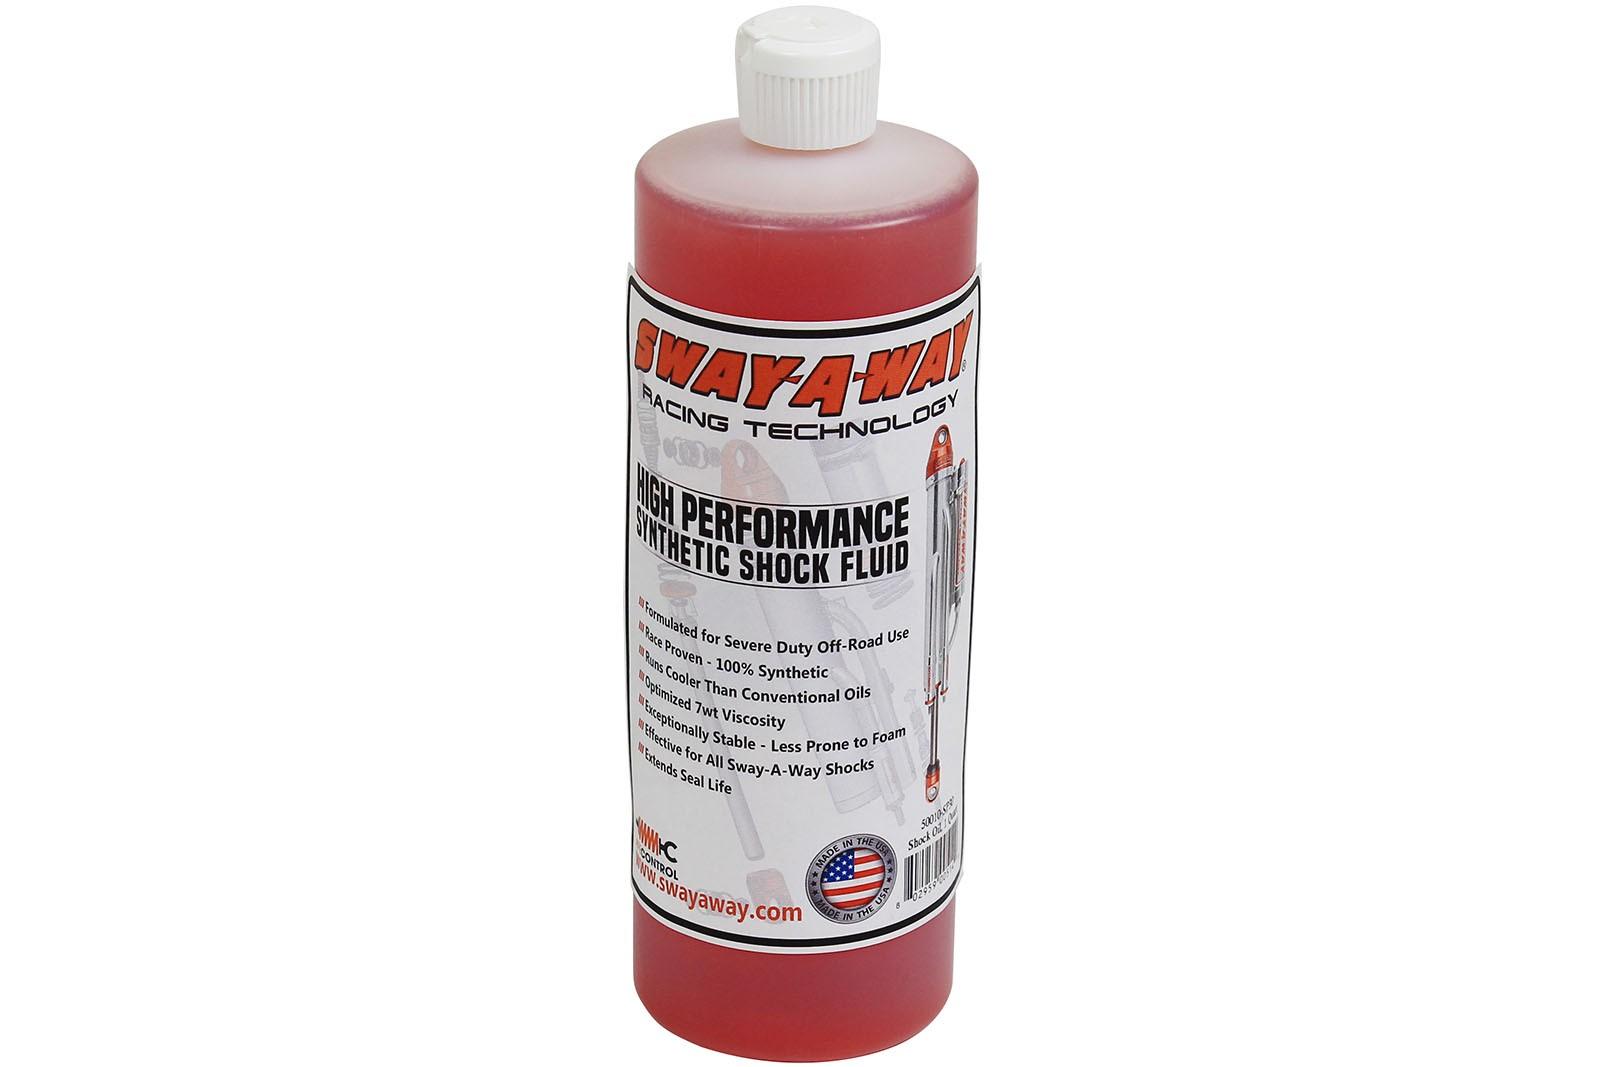 aFe POWER 50010-SP30 aFe Control Sway-A-Way Shock Oil, 1 Quart